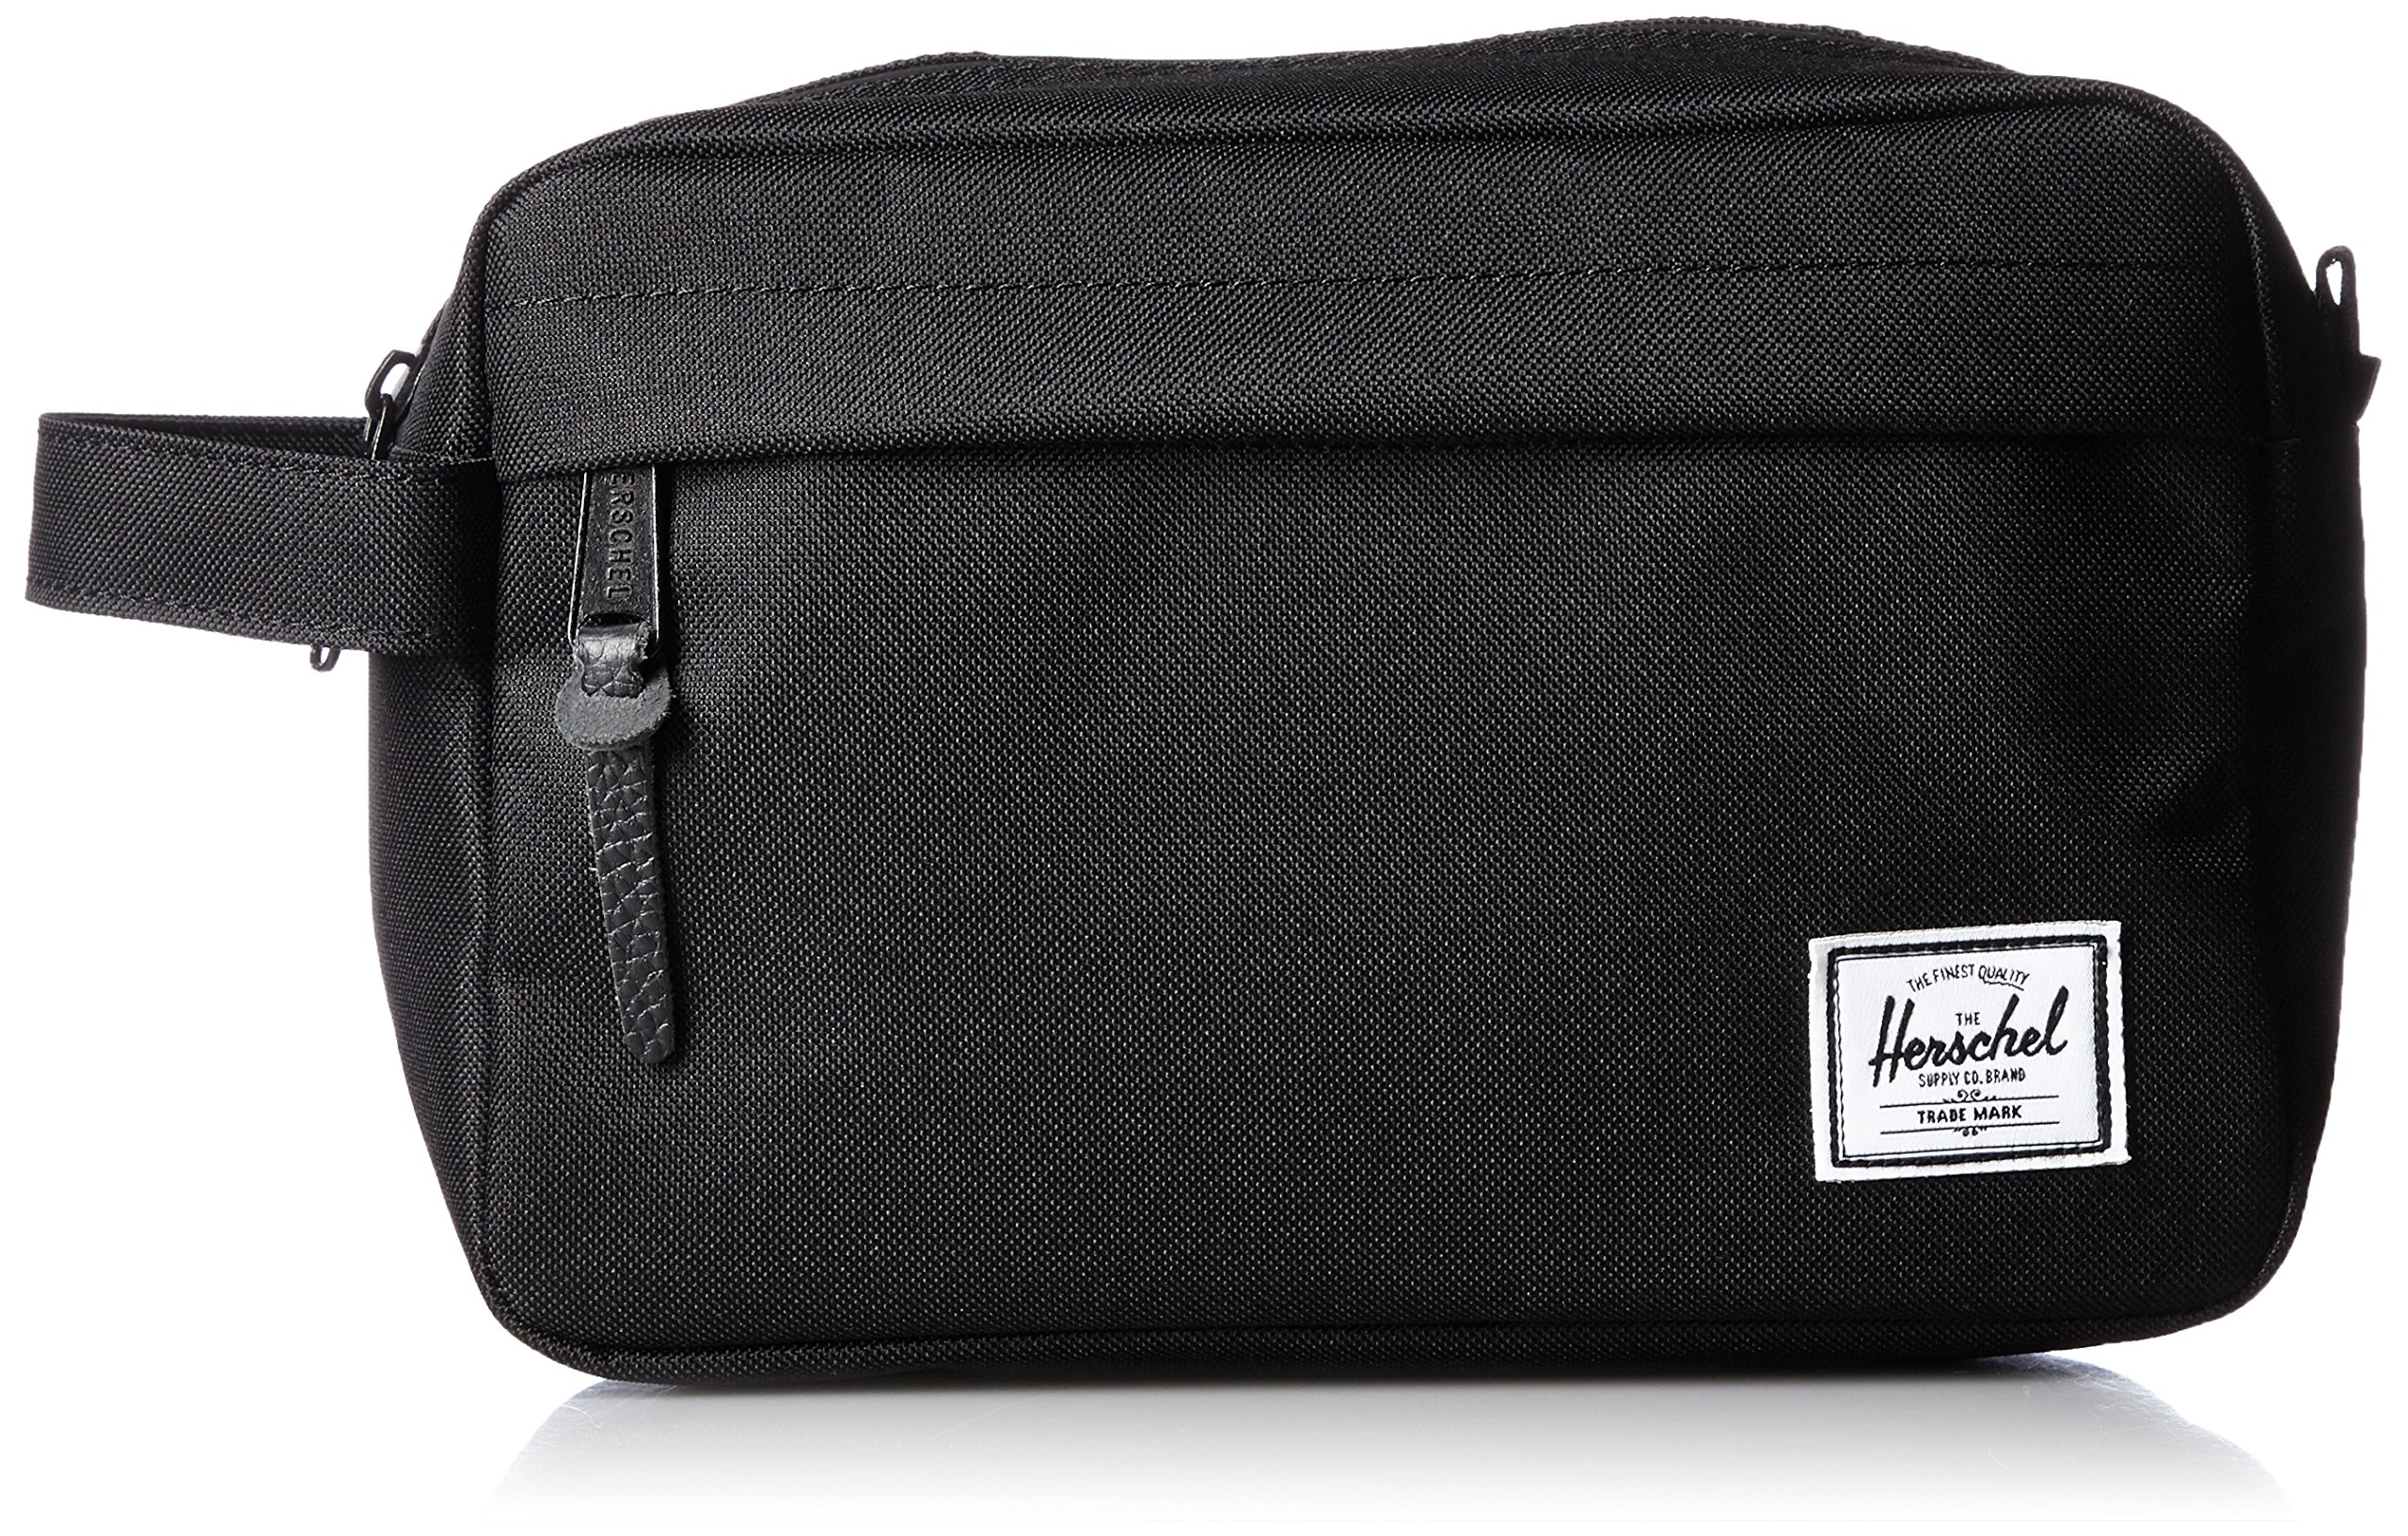 Herschel Supply Co. Chapter Travel Kit,Black,One Size by Herschel Supply Co. (Image #2)